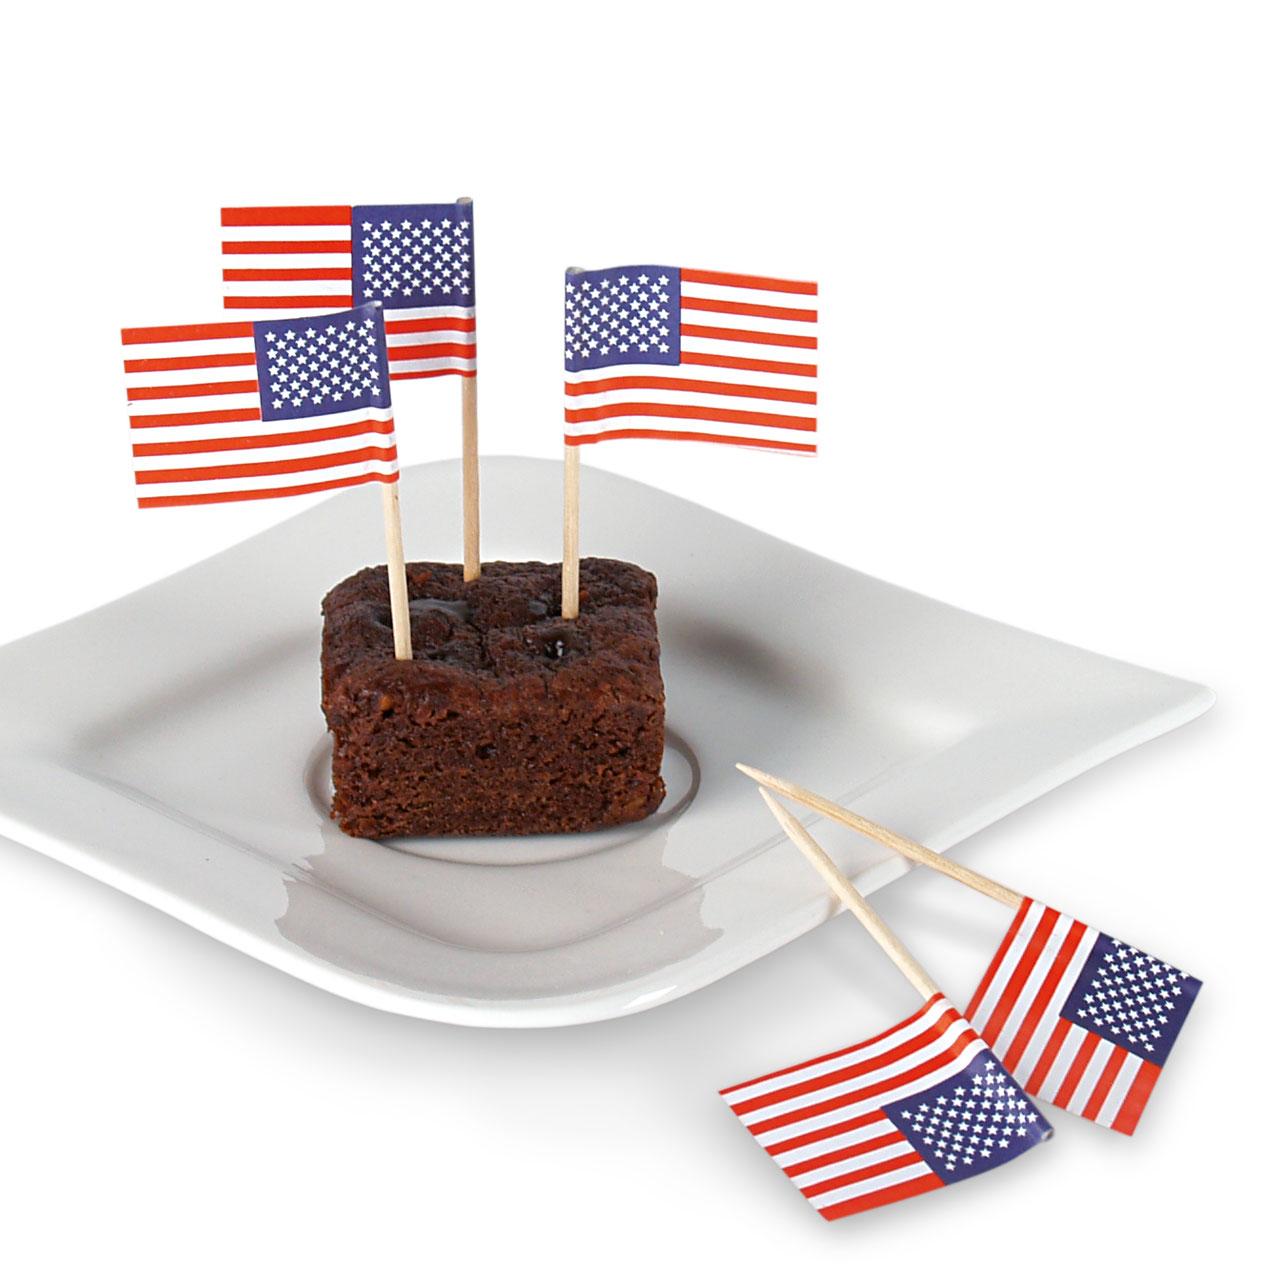 Party-Picker Flagge USA, Weiß-blau-rot, 50 Stück